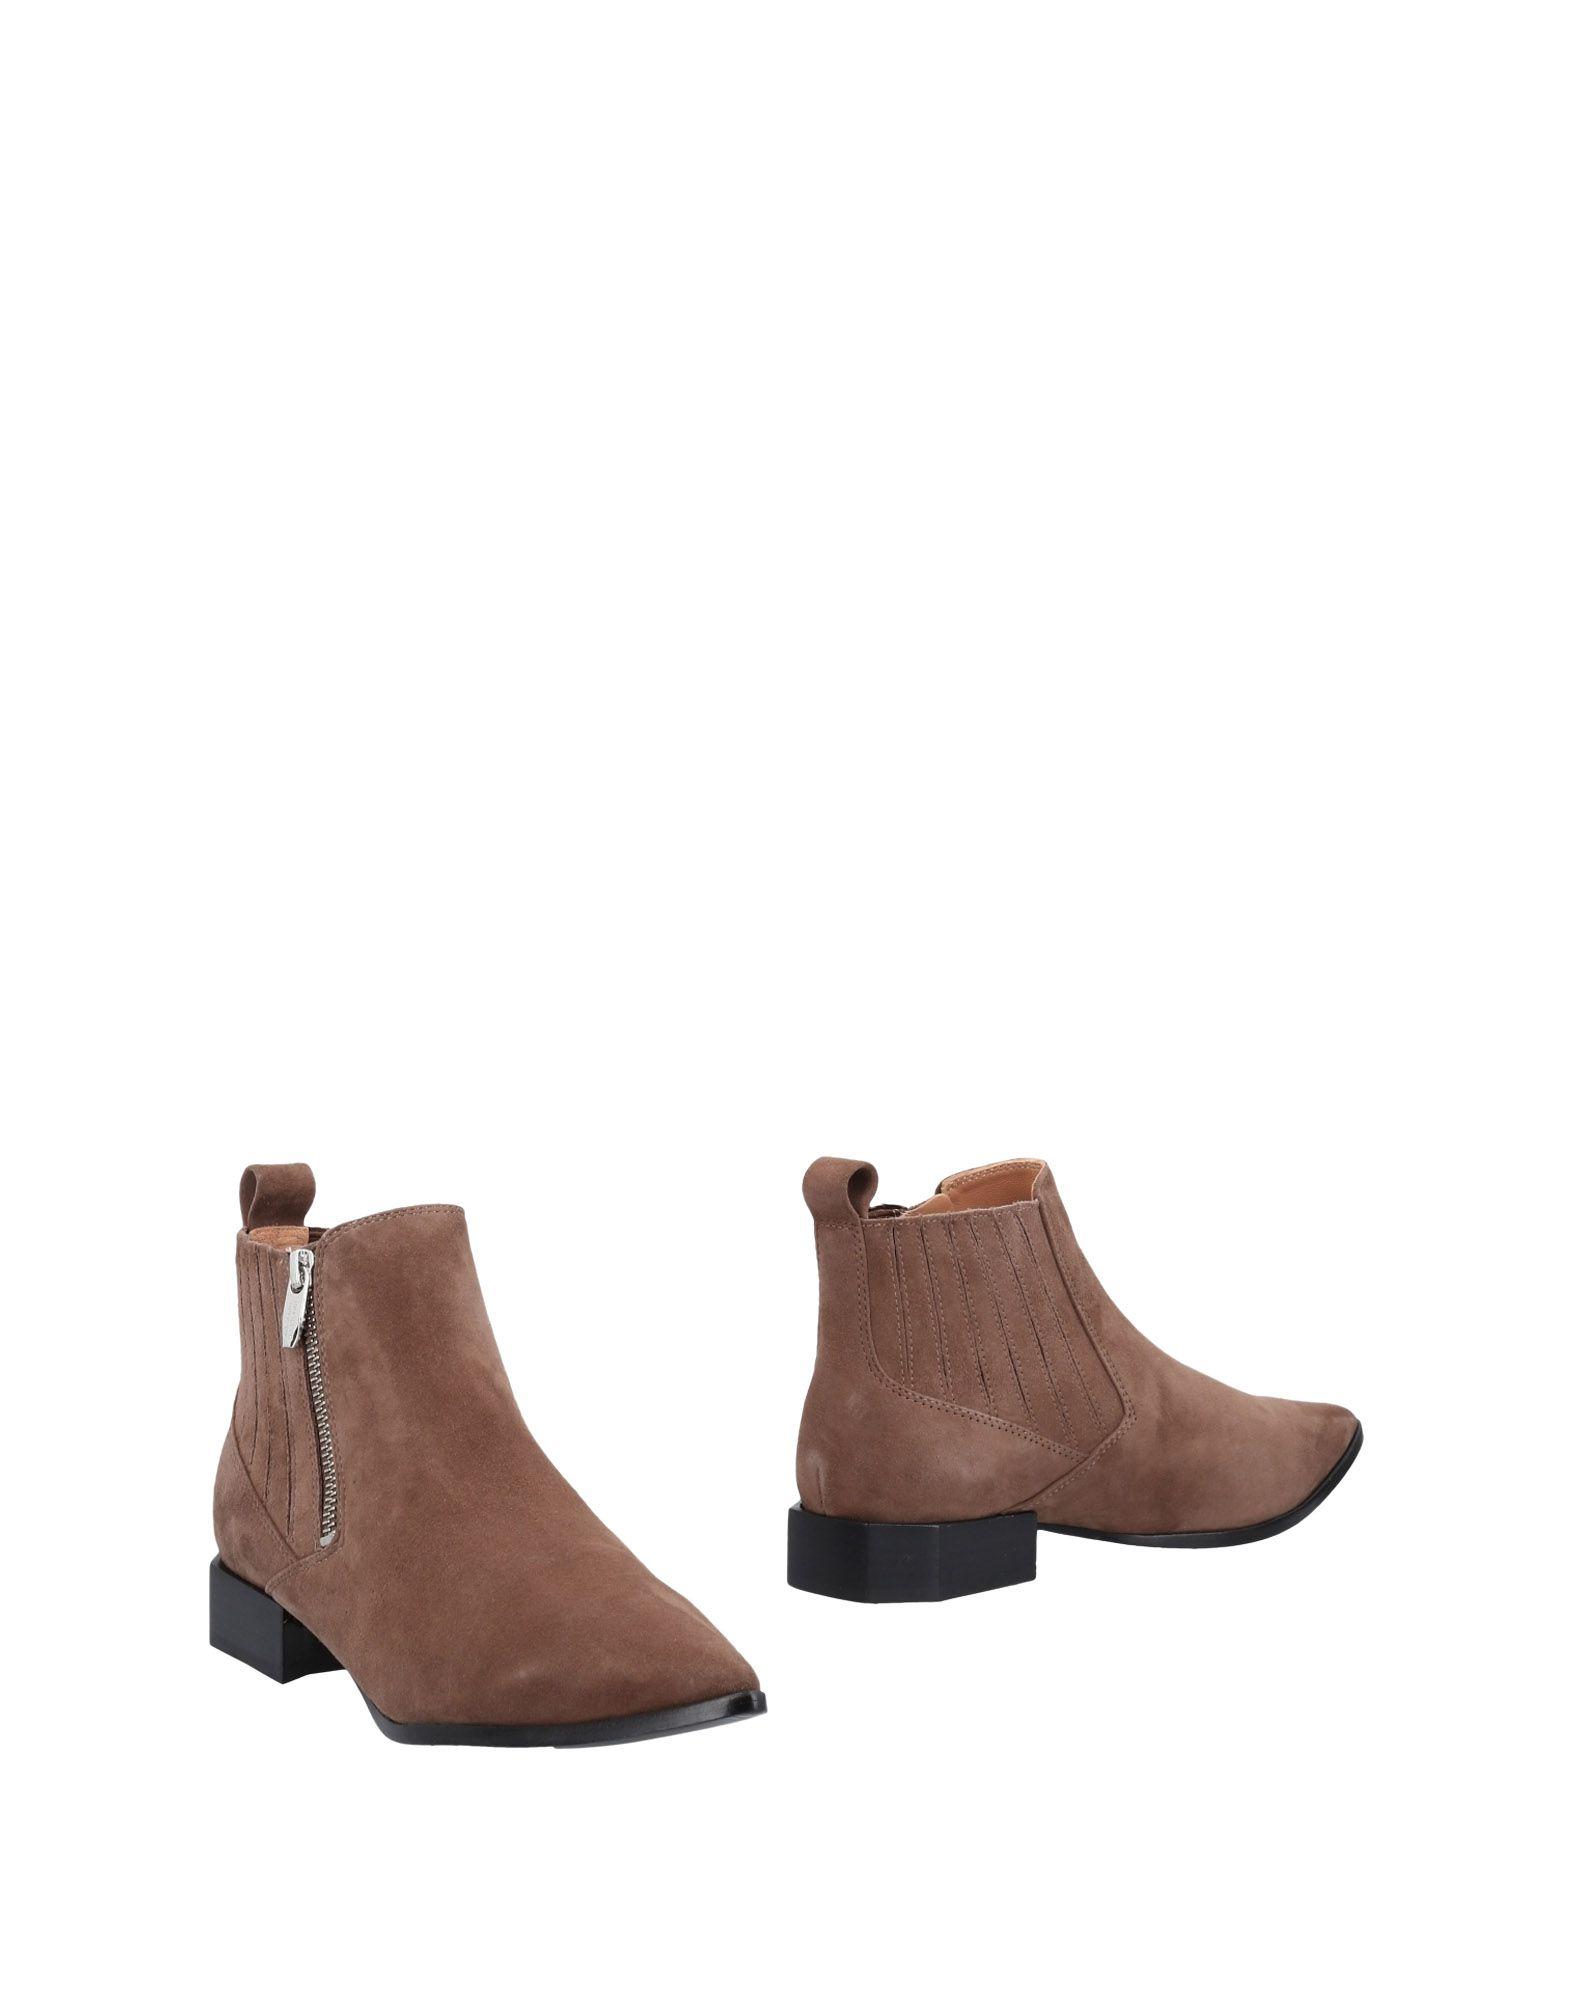 Stilvolle billige Schuhe Damen Sigerson Morrison Chelsea Stiefel Damen Schuhe  11484198KM 47ebc2